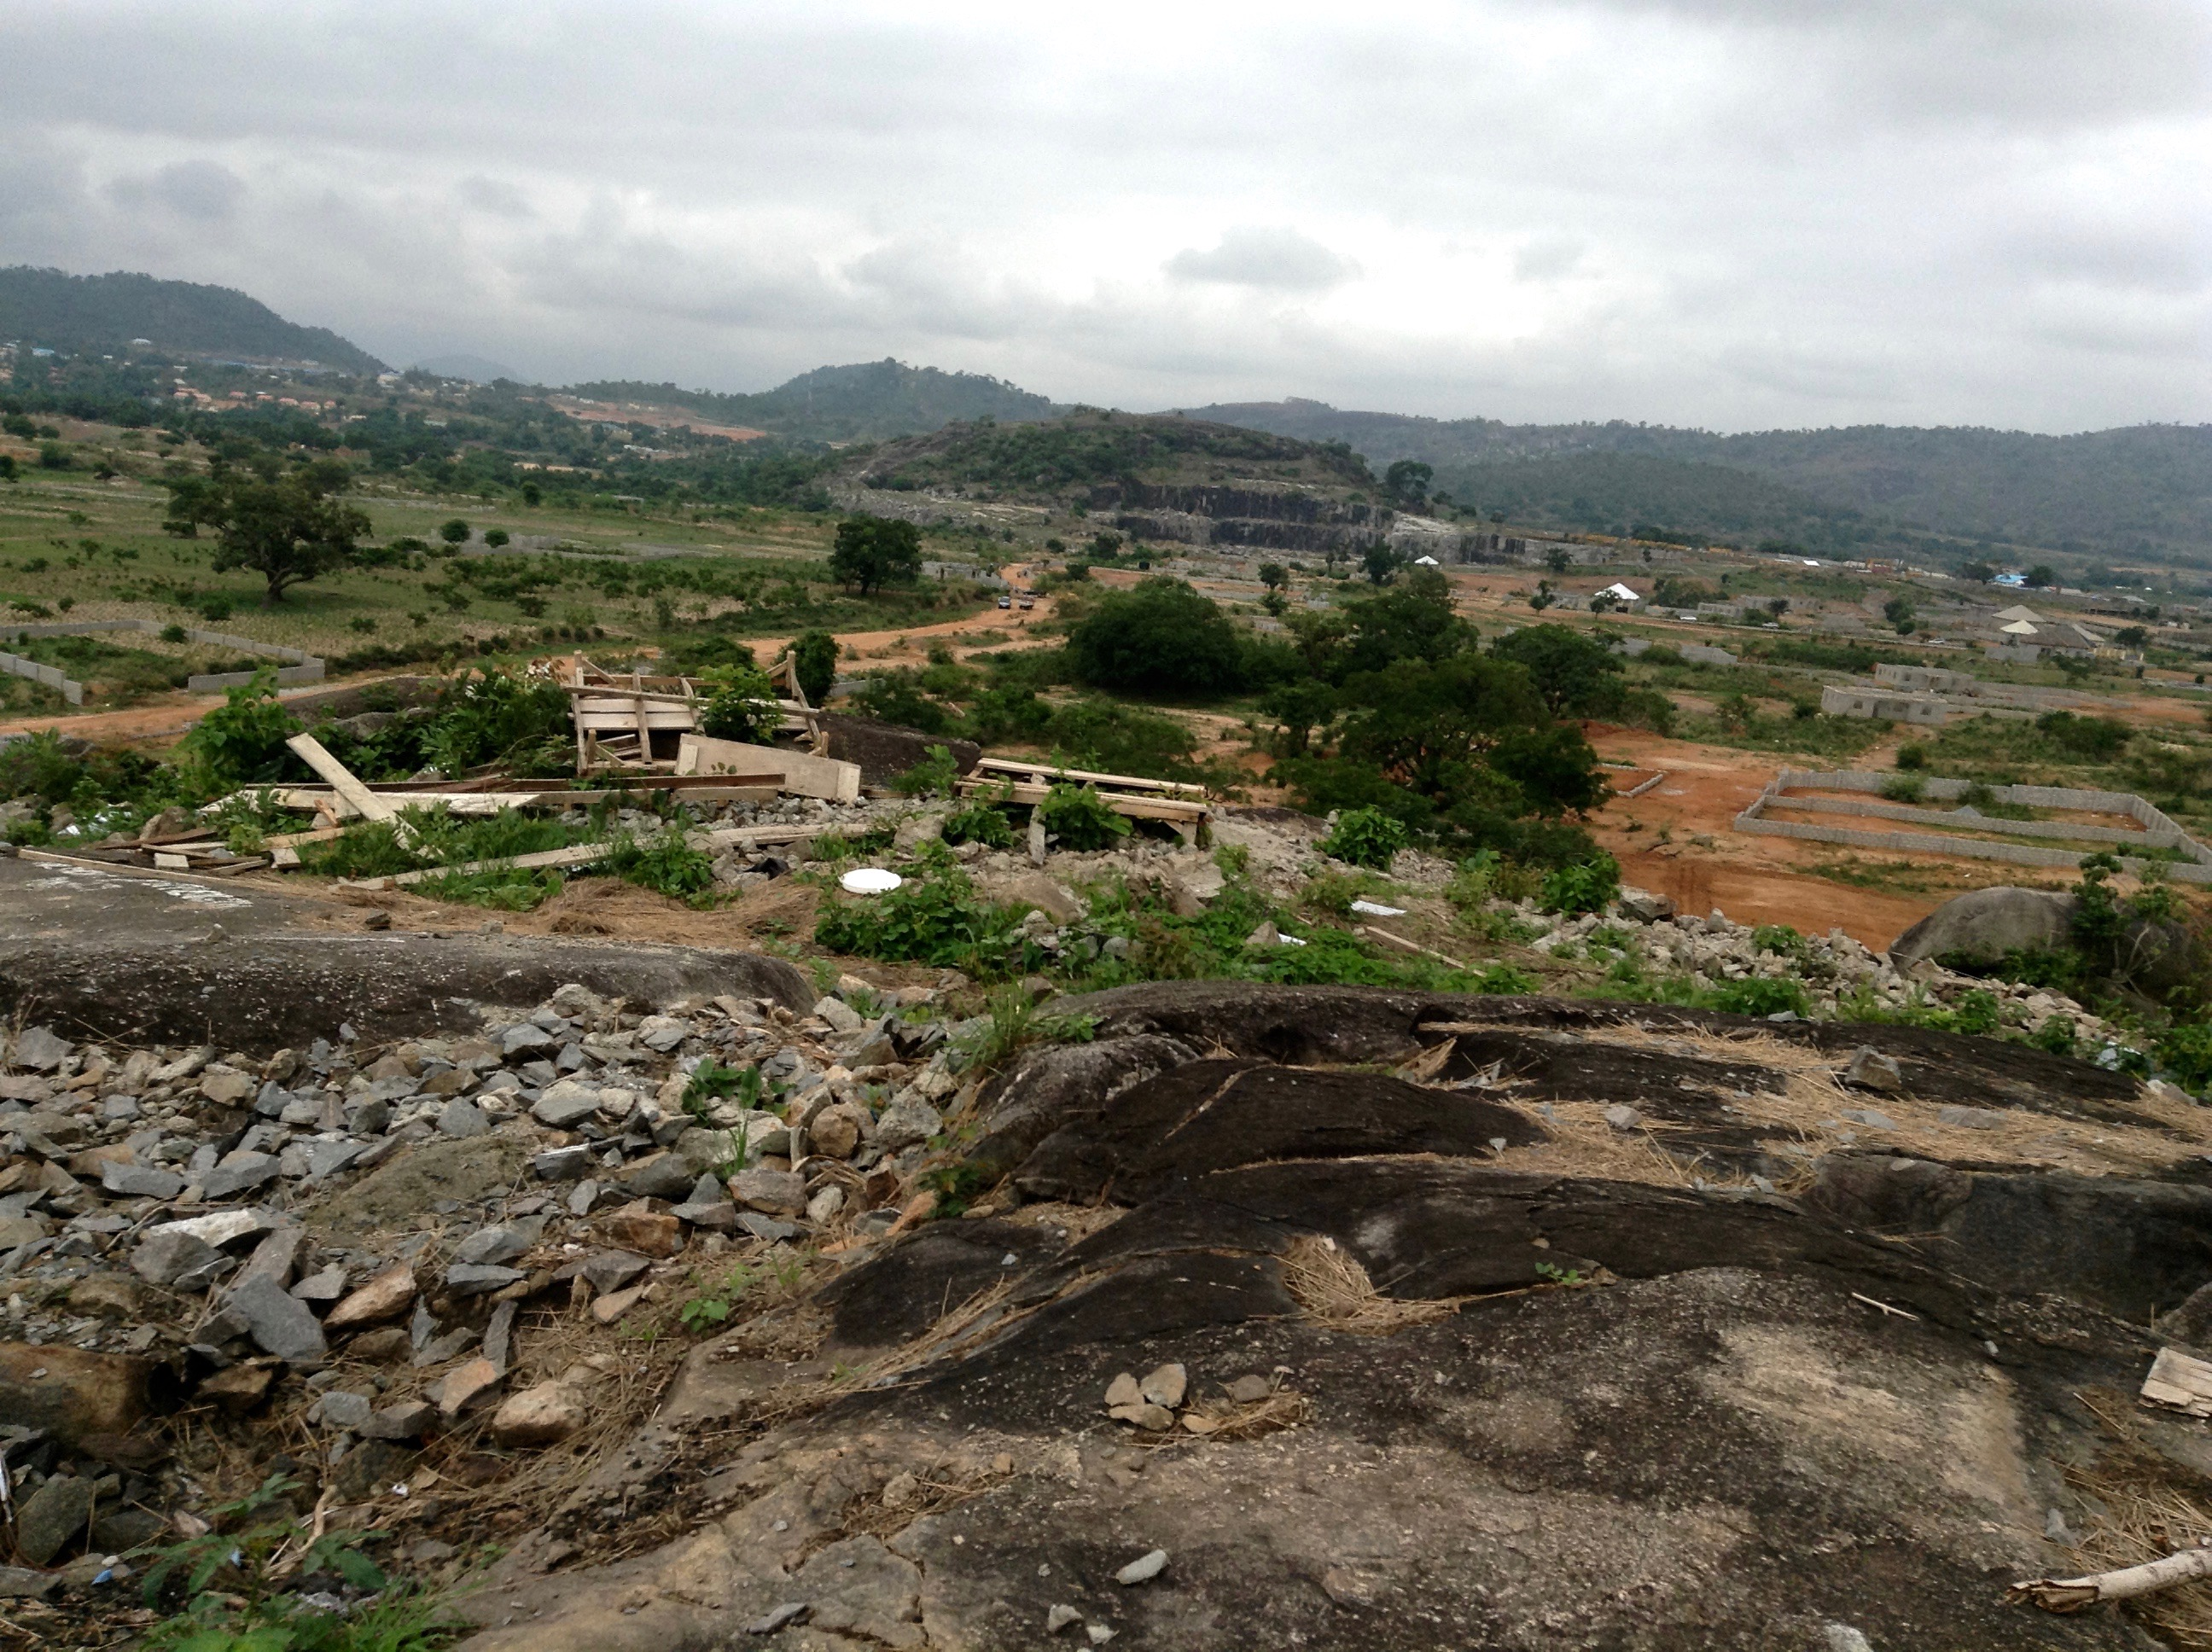 Ushafa Village, FCT, Nigeria. #JujuFilms